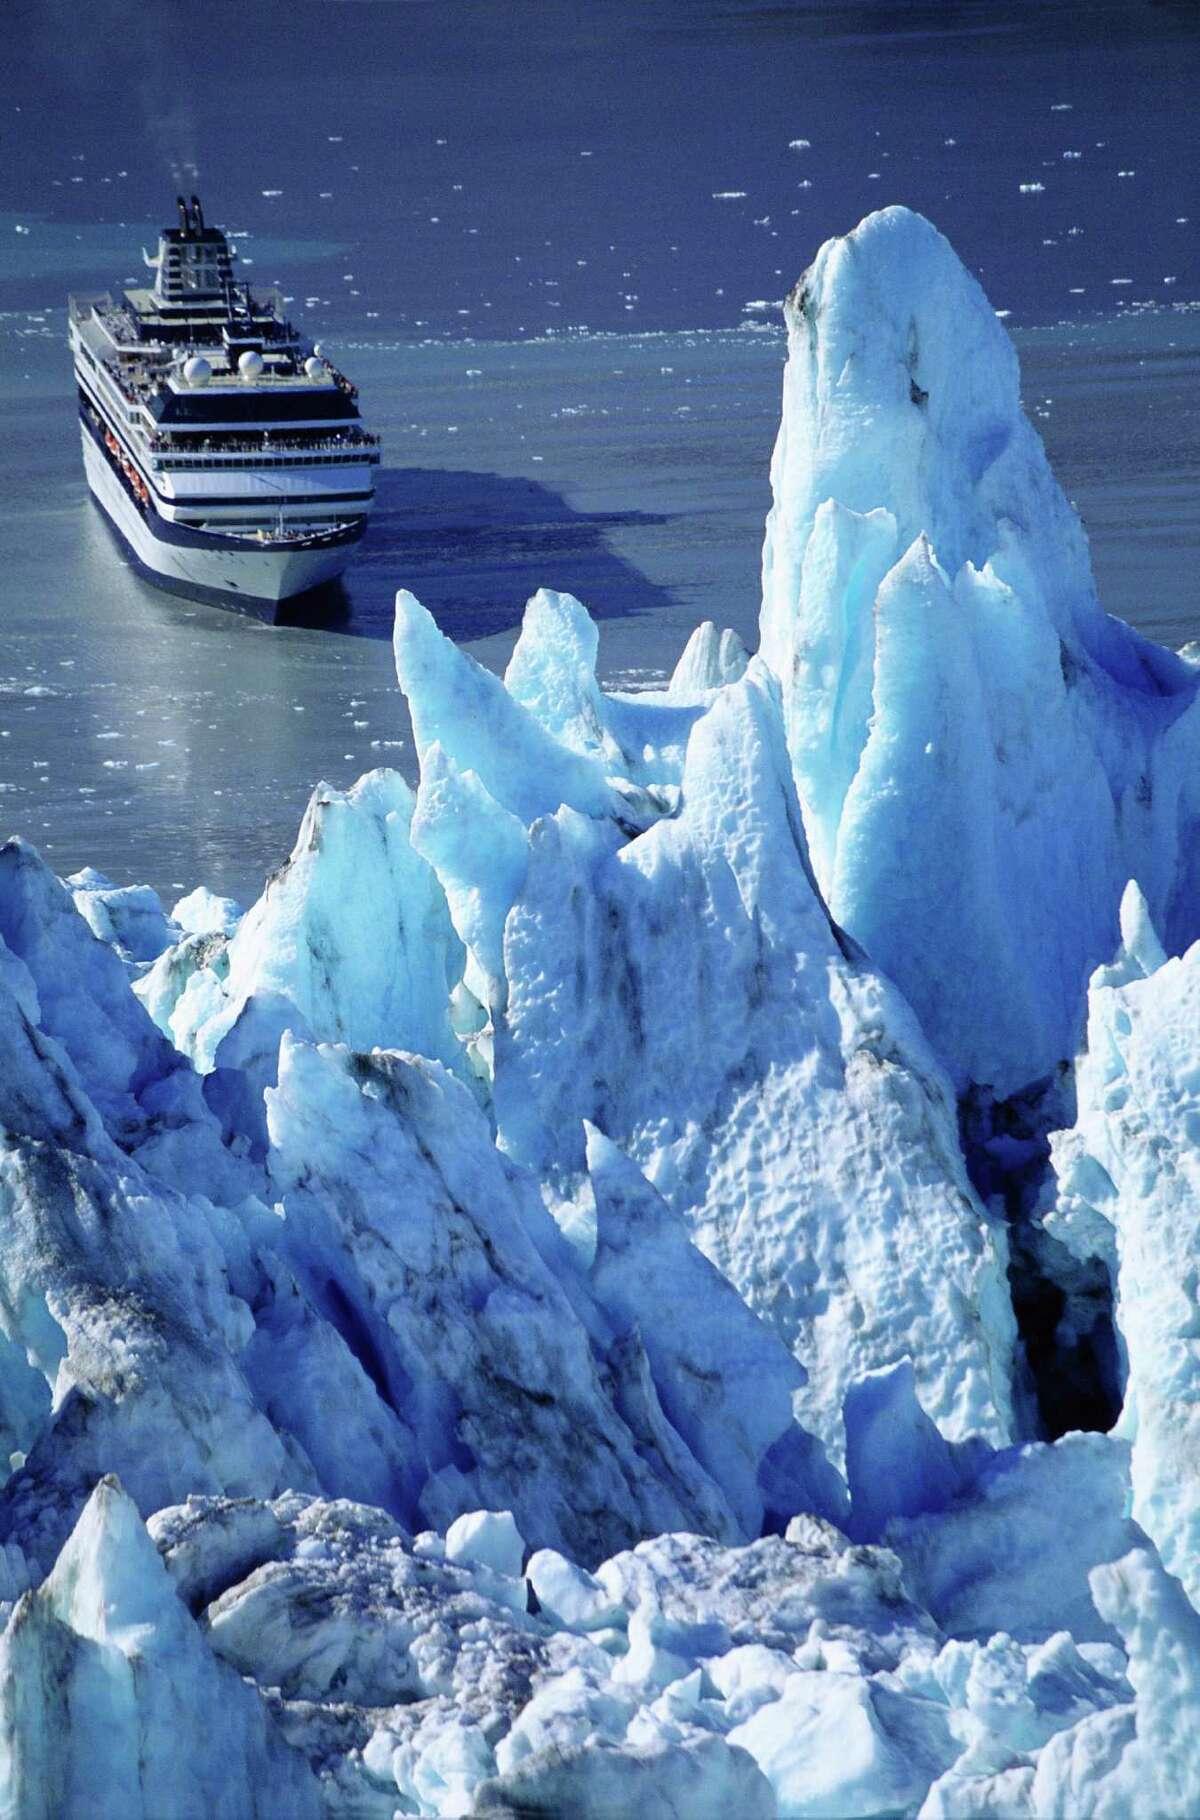 Cruise ship in Glacier Bay National Park.